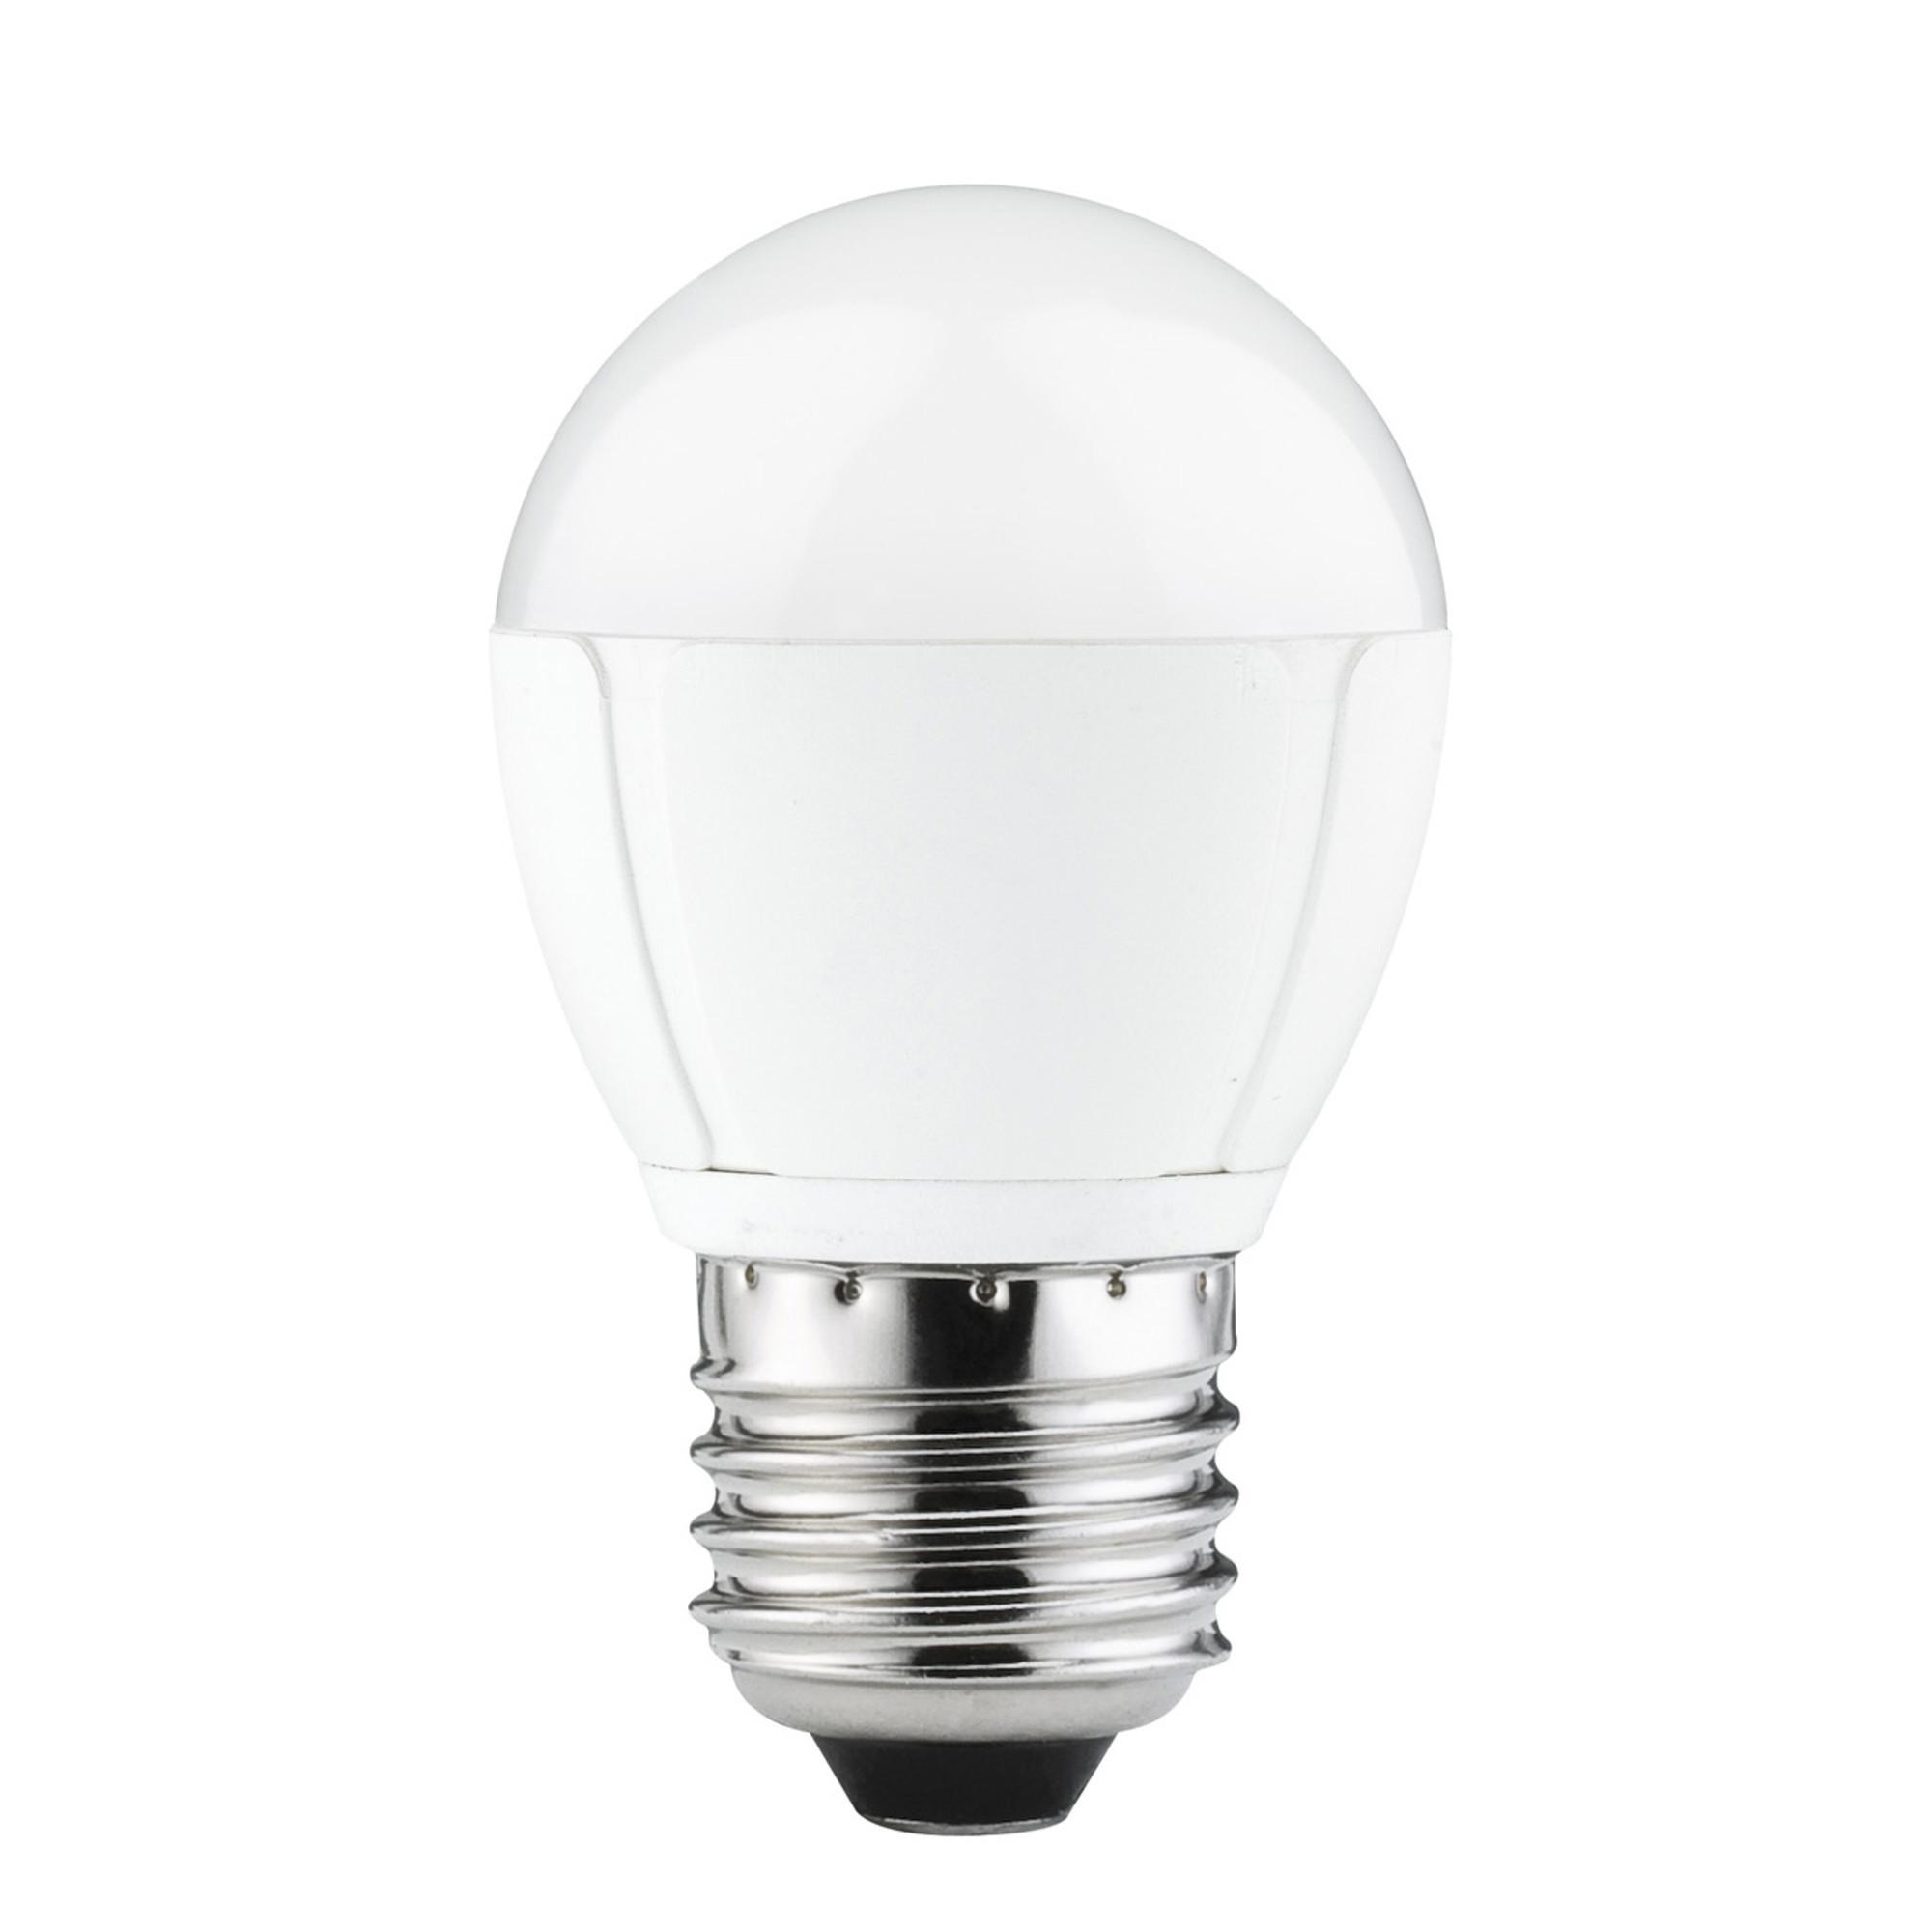 Лампа светодиодная Paulmann 28149 E27 350 Лм теплый свет